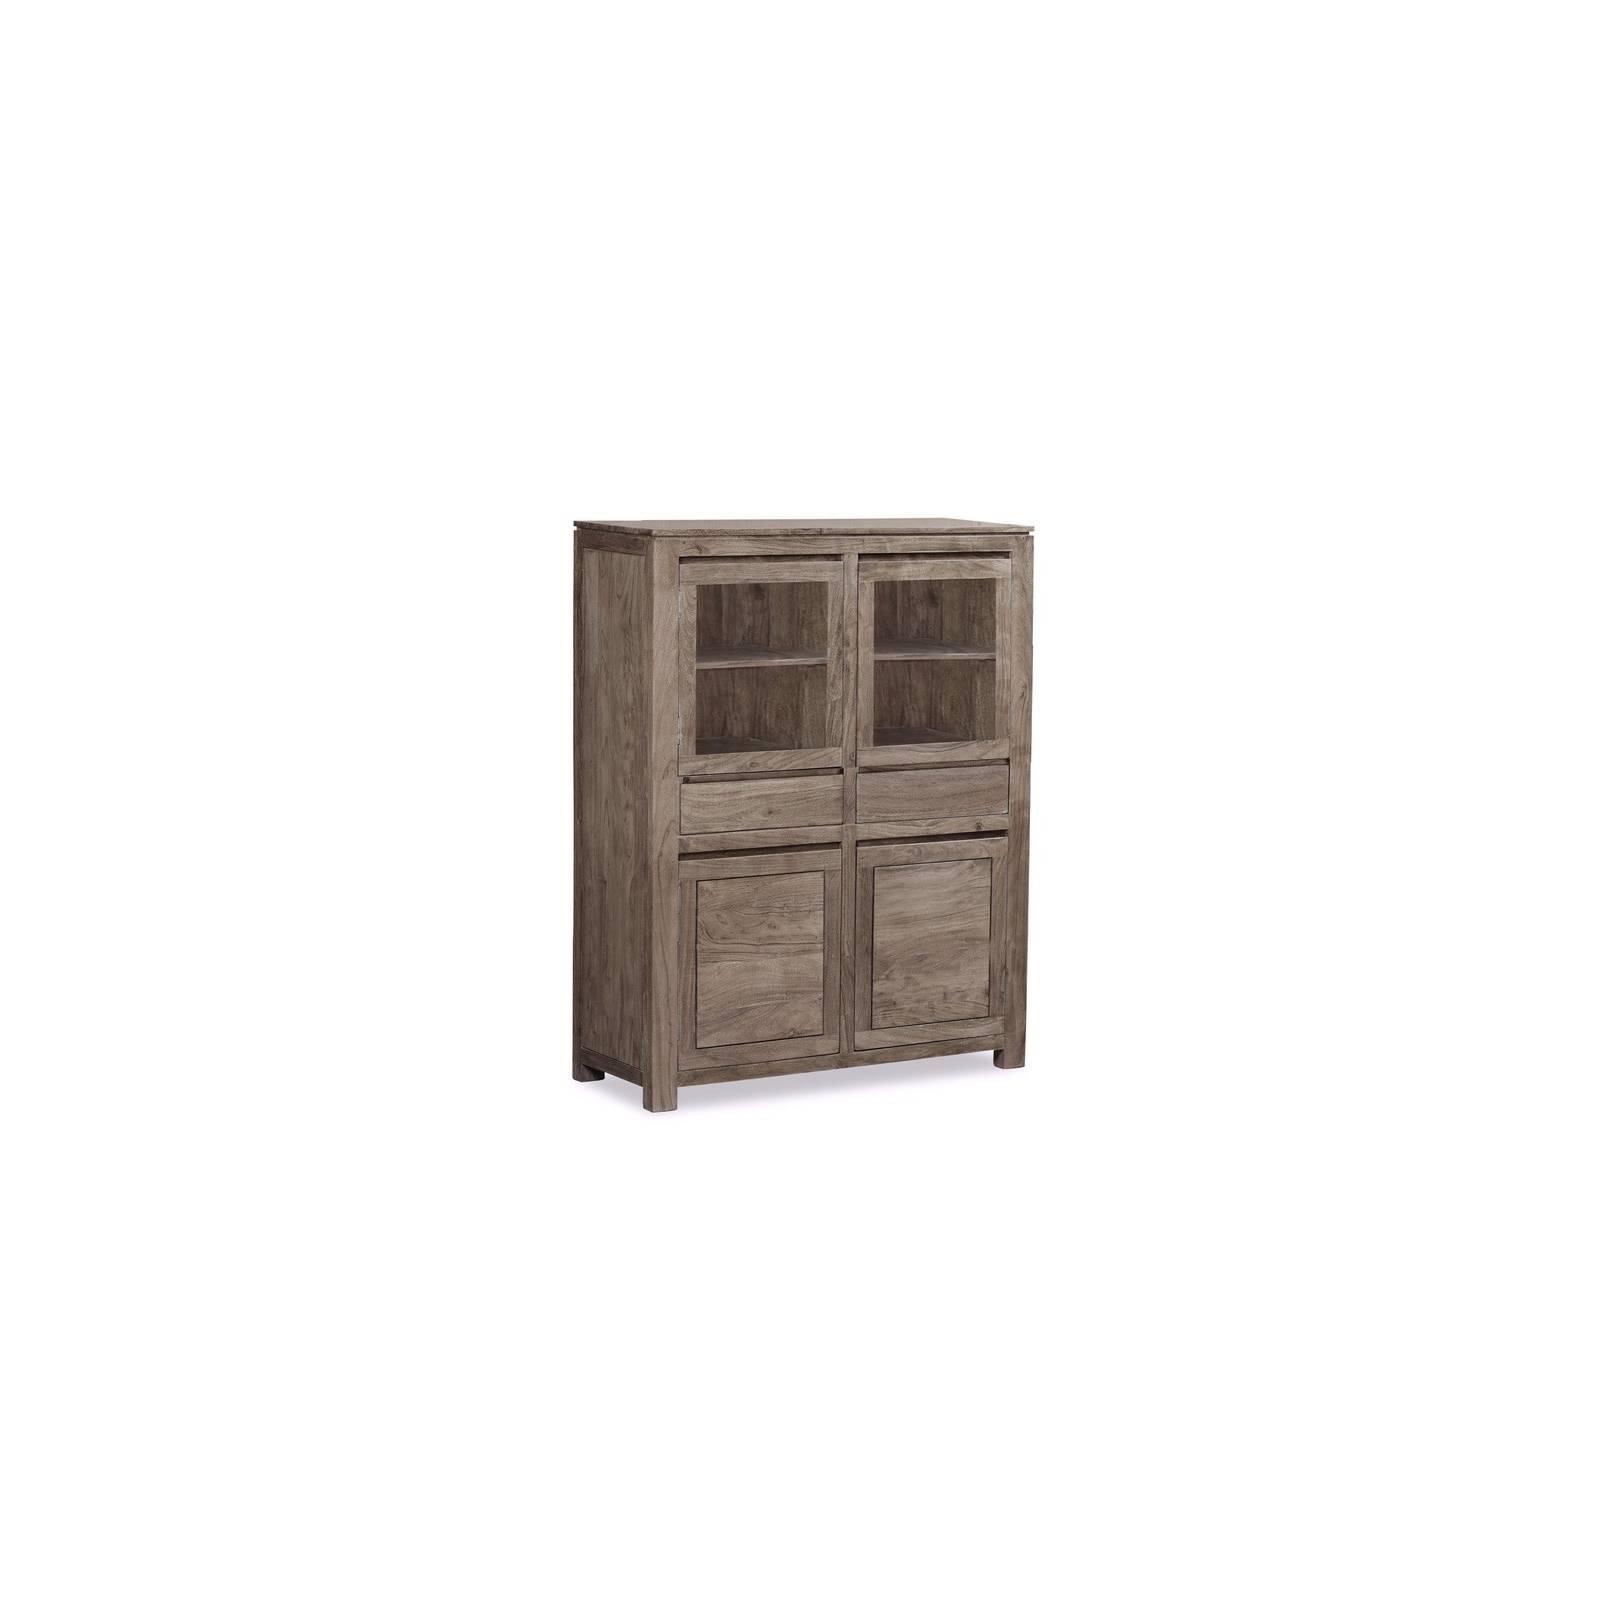 Buffet Haut Tara Grisée Acacia - meuble design haut de gamme